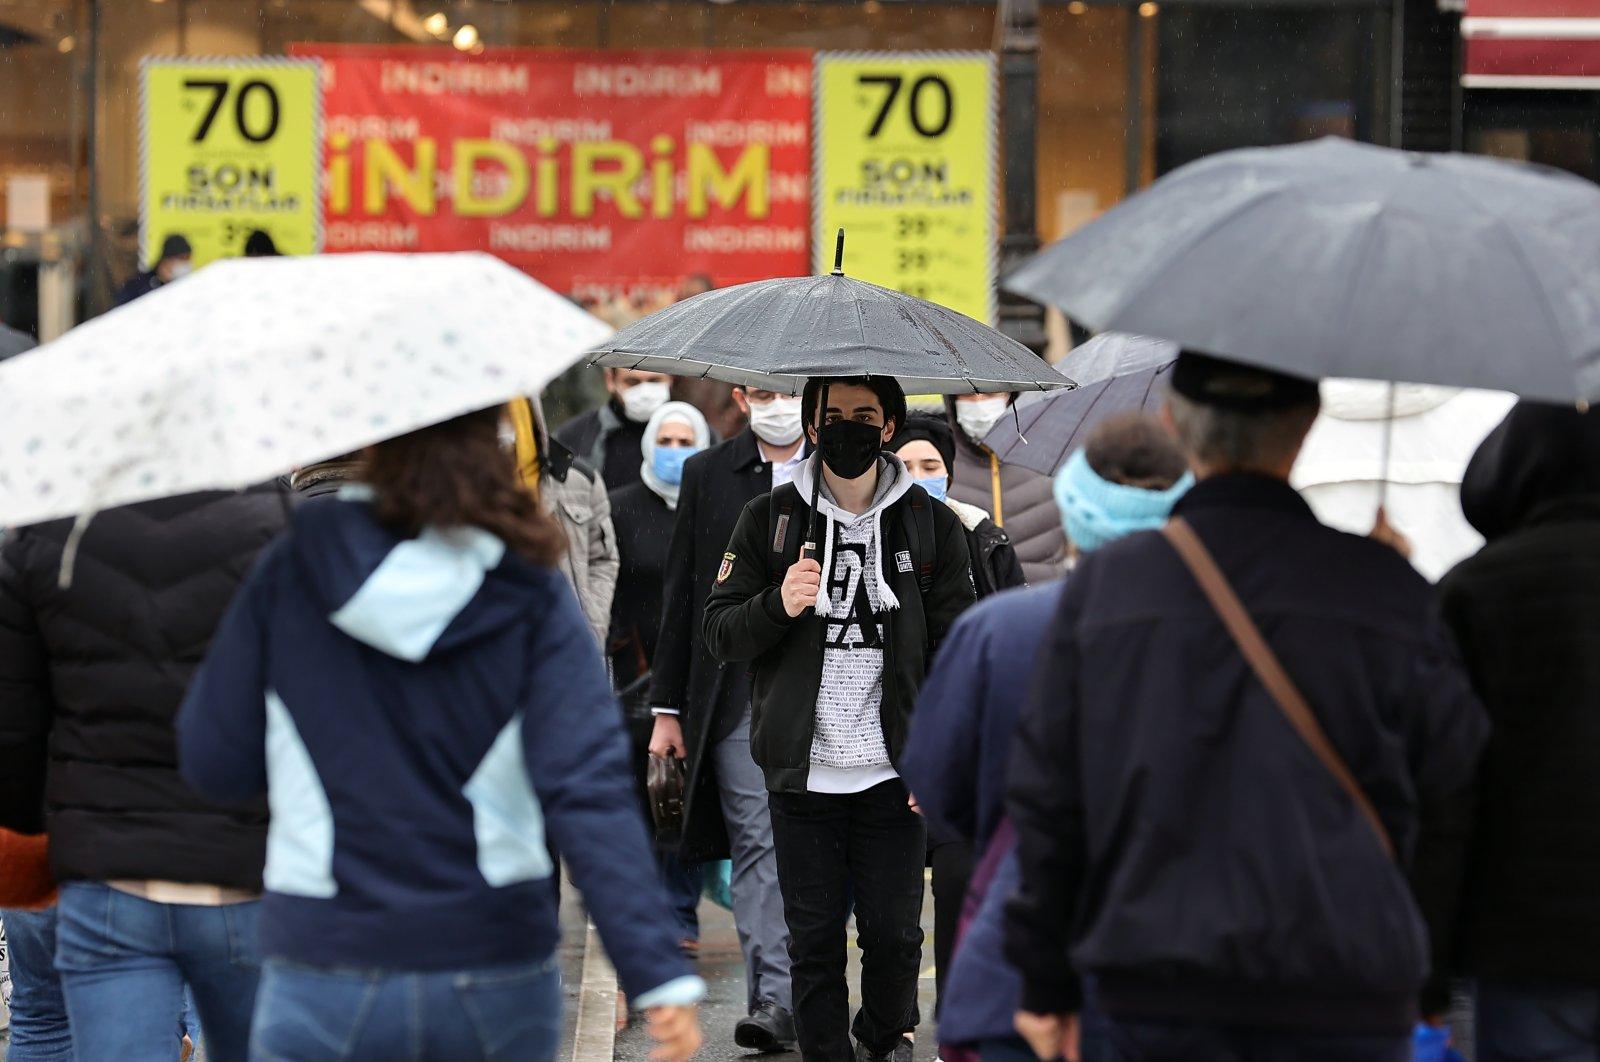 People with umbrellas walk in the rain in the capital, Ankara, Turkey, Mar. 20, 2021 (AA Photo)